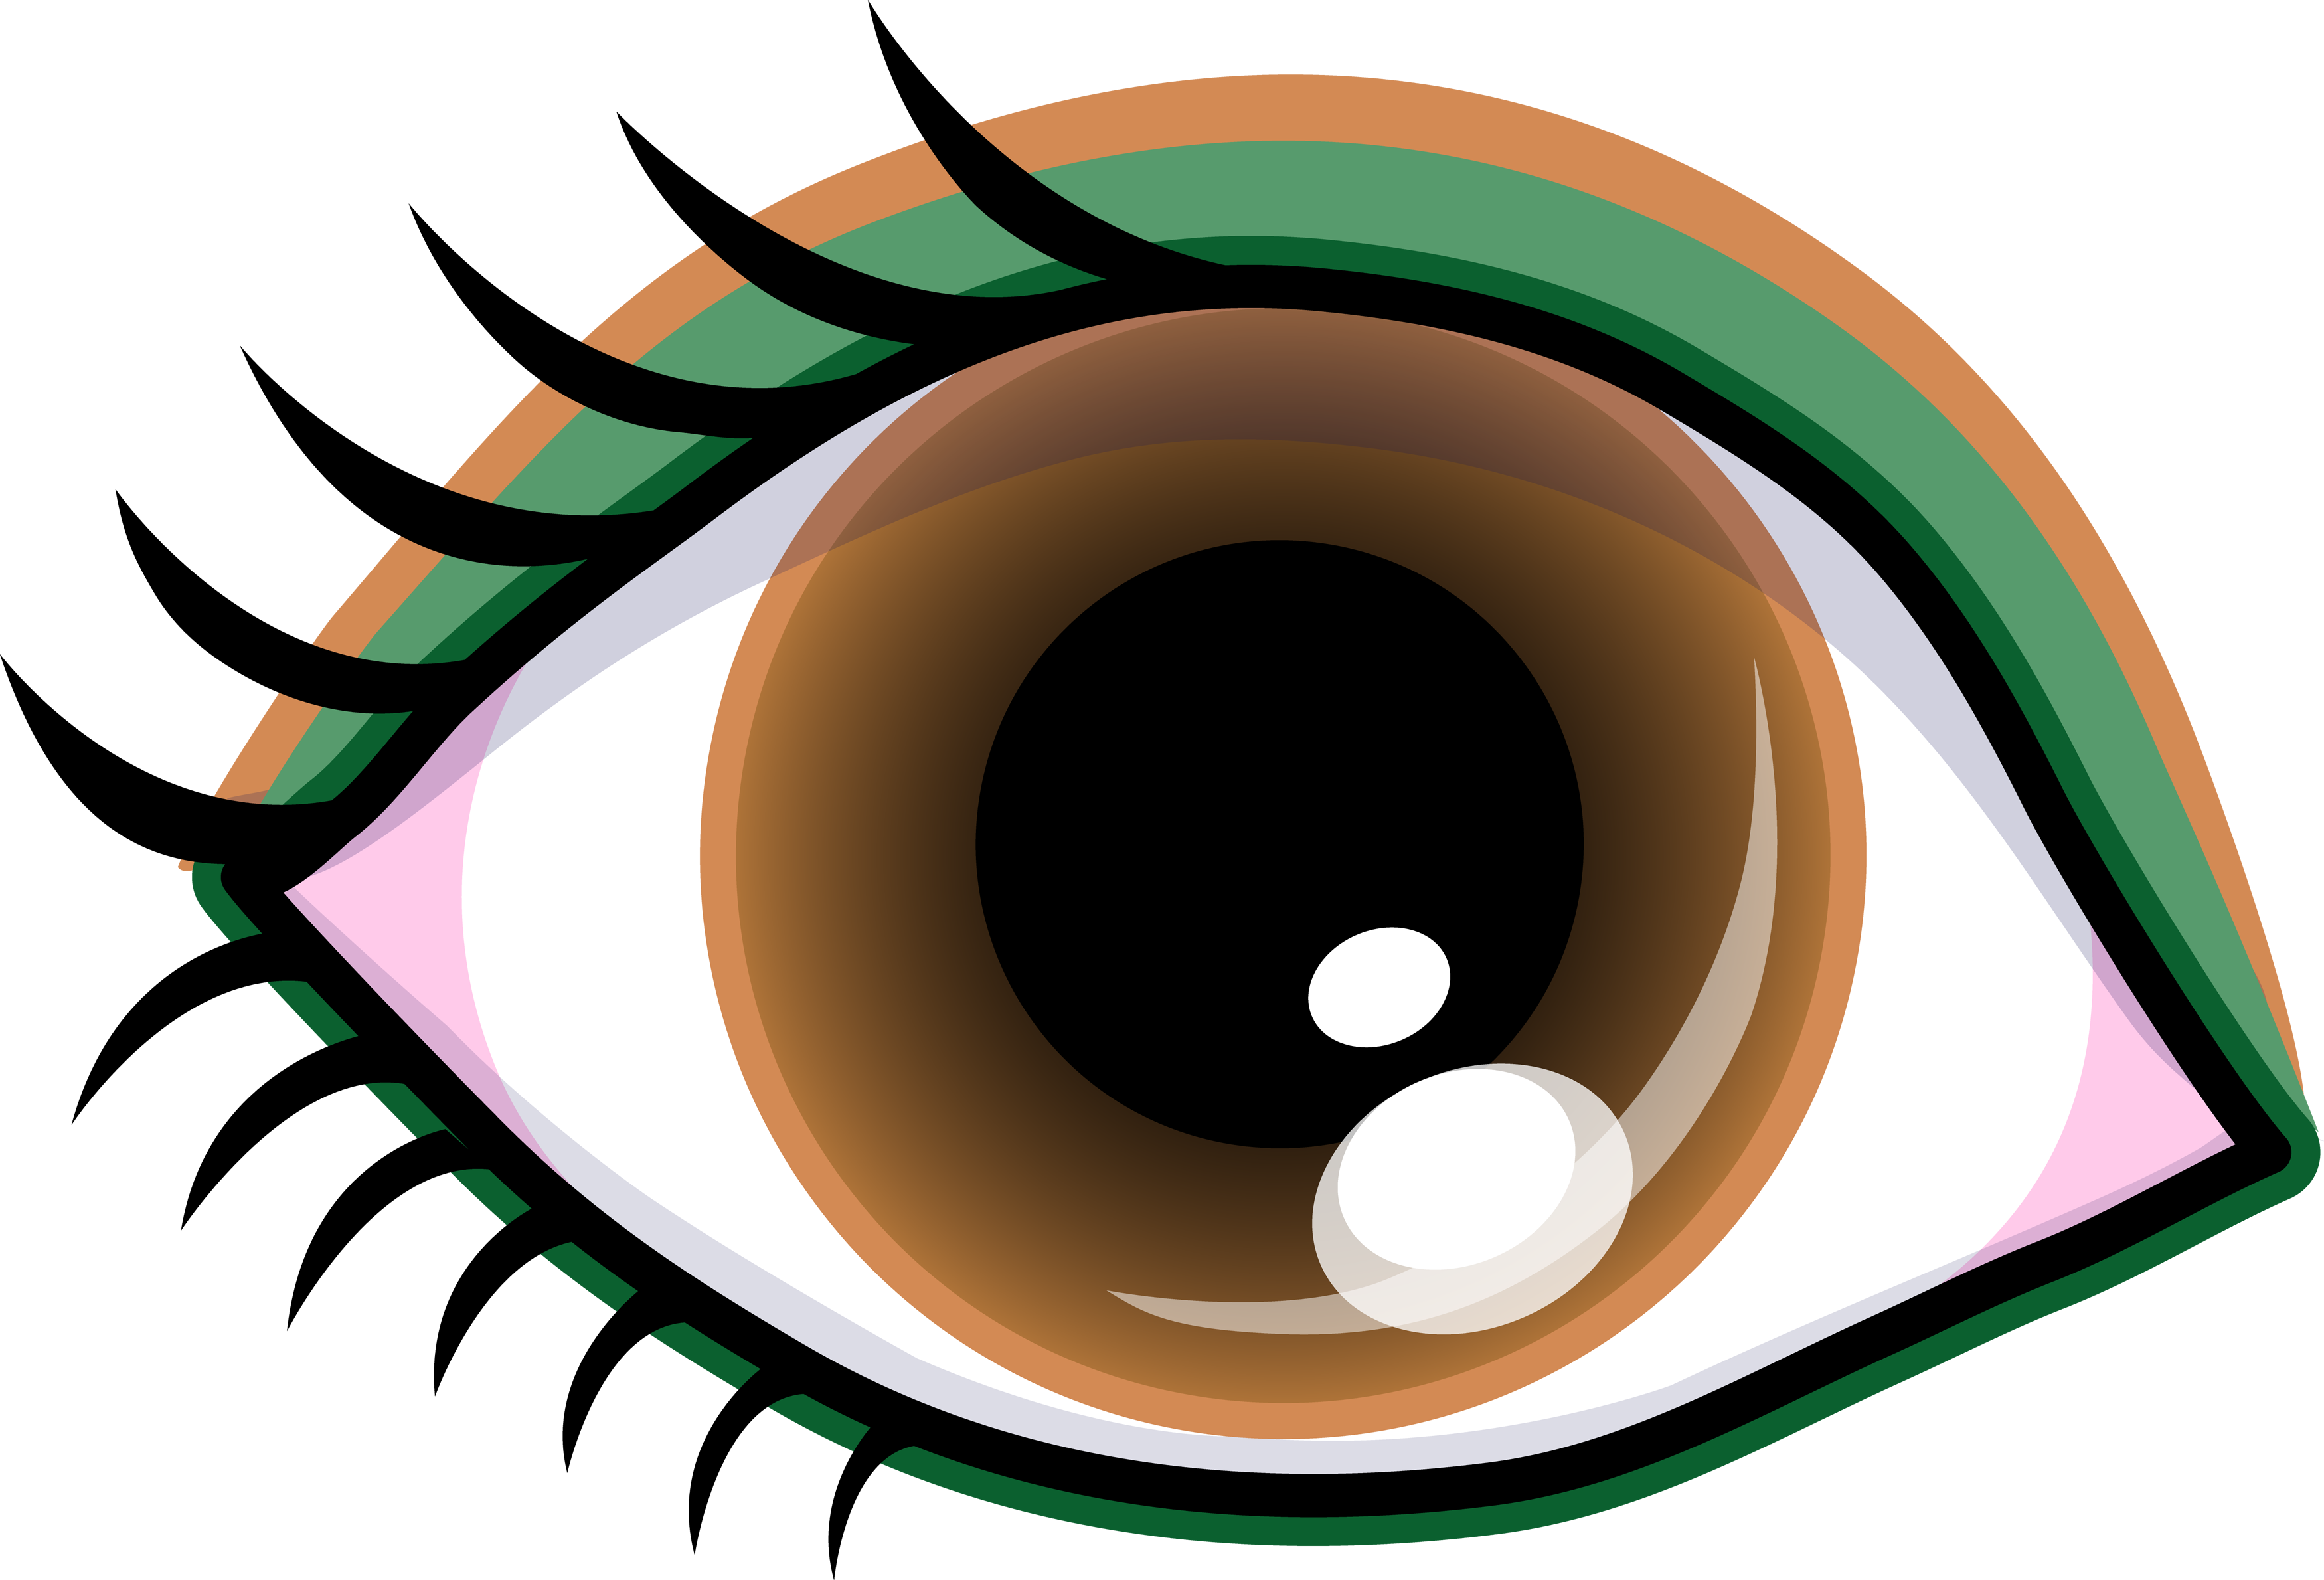 Black circle girl eye clipart jpg free stock Pretty Brown Eye With Shadow - Free Clip Art jpg free stock